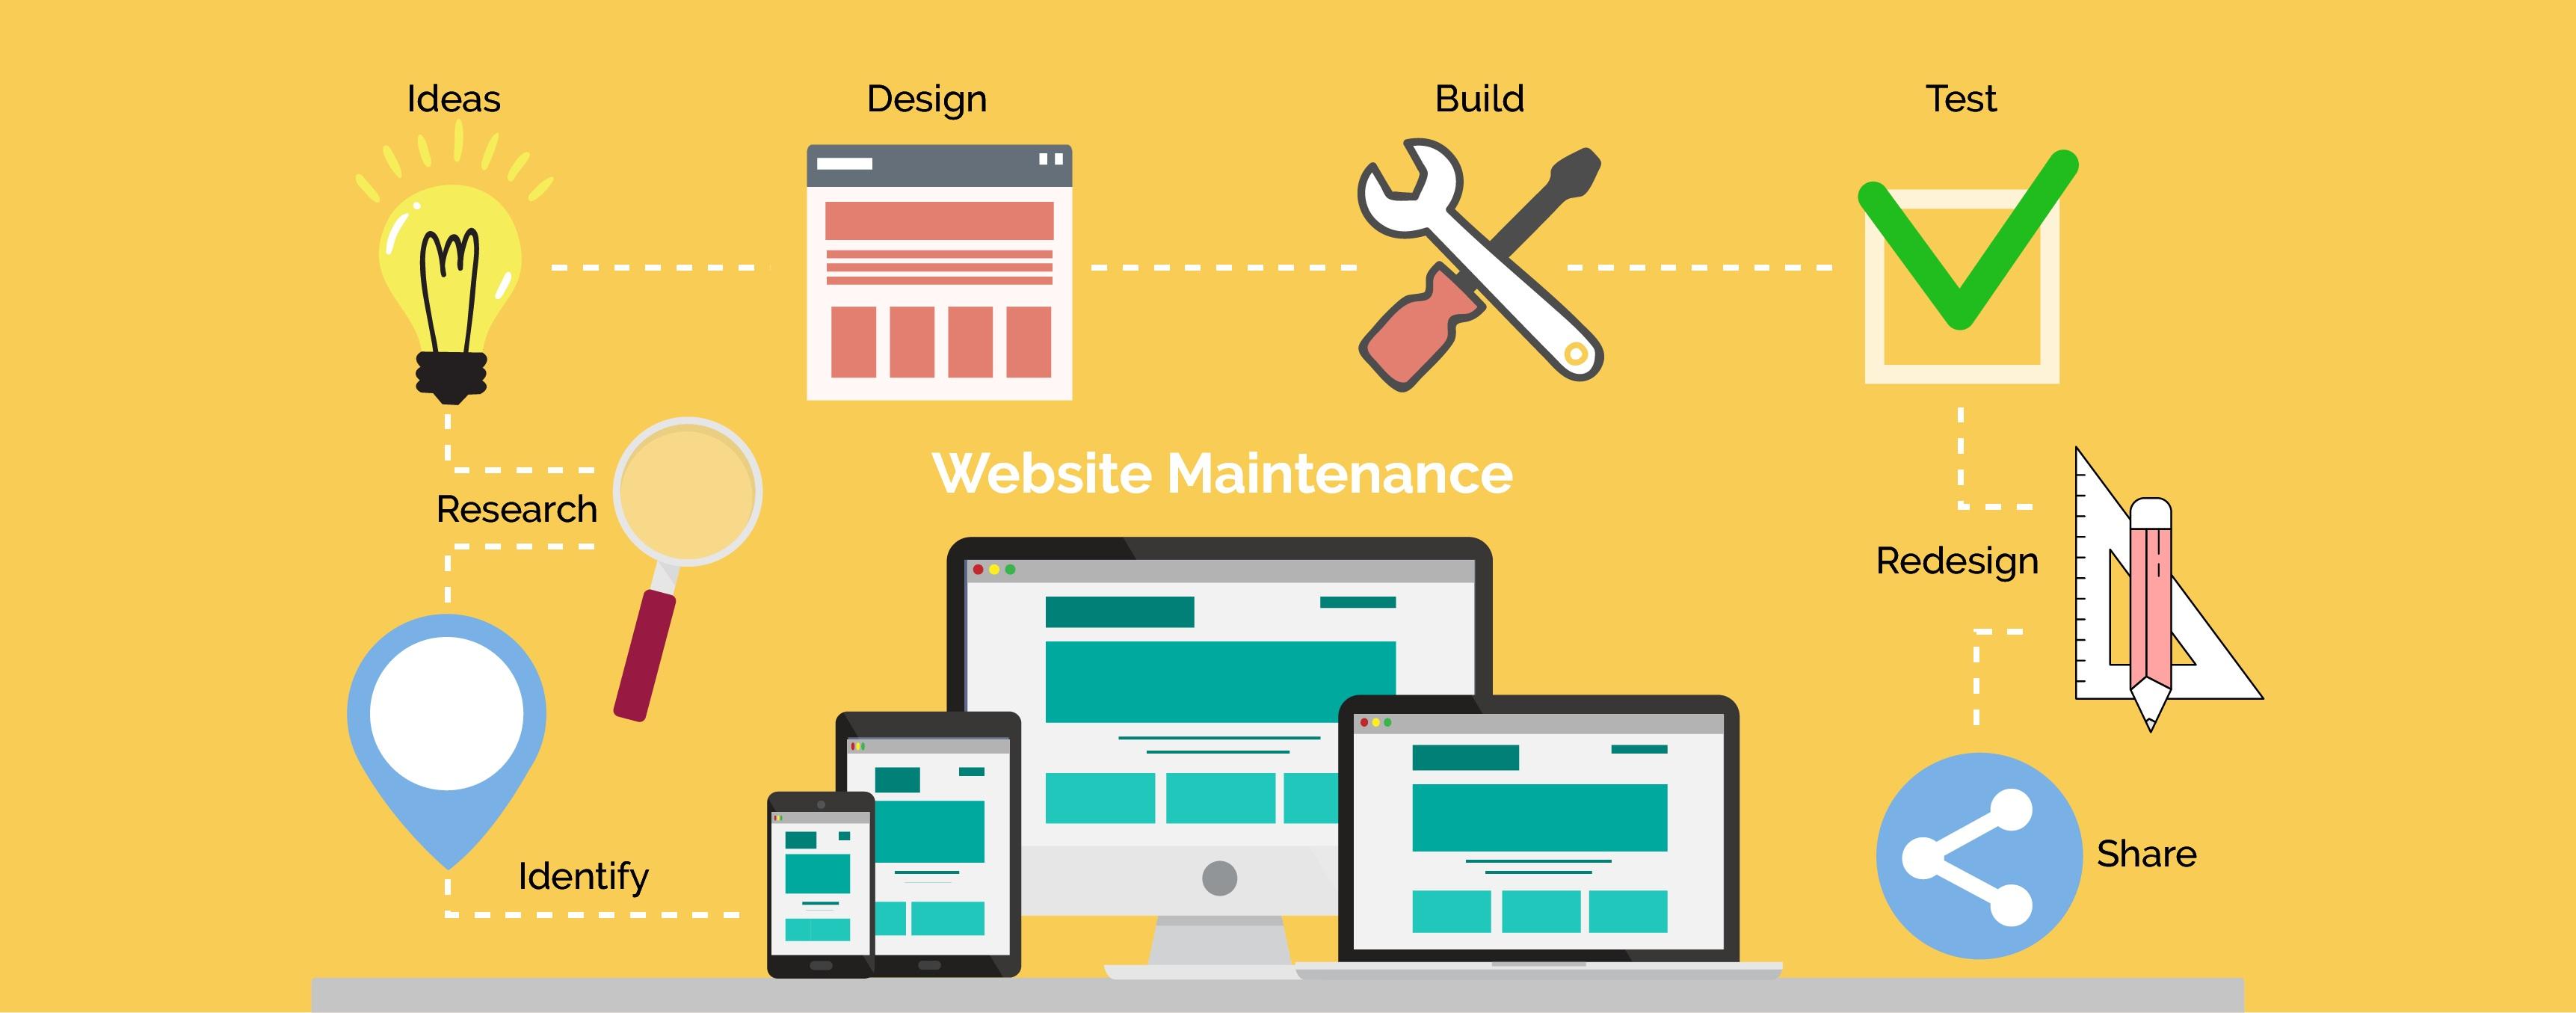 Custom Application Development process